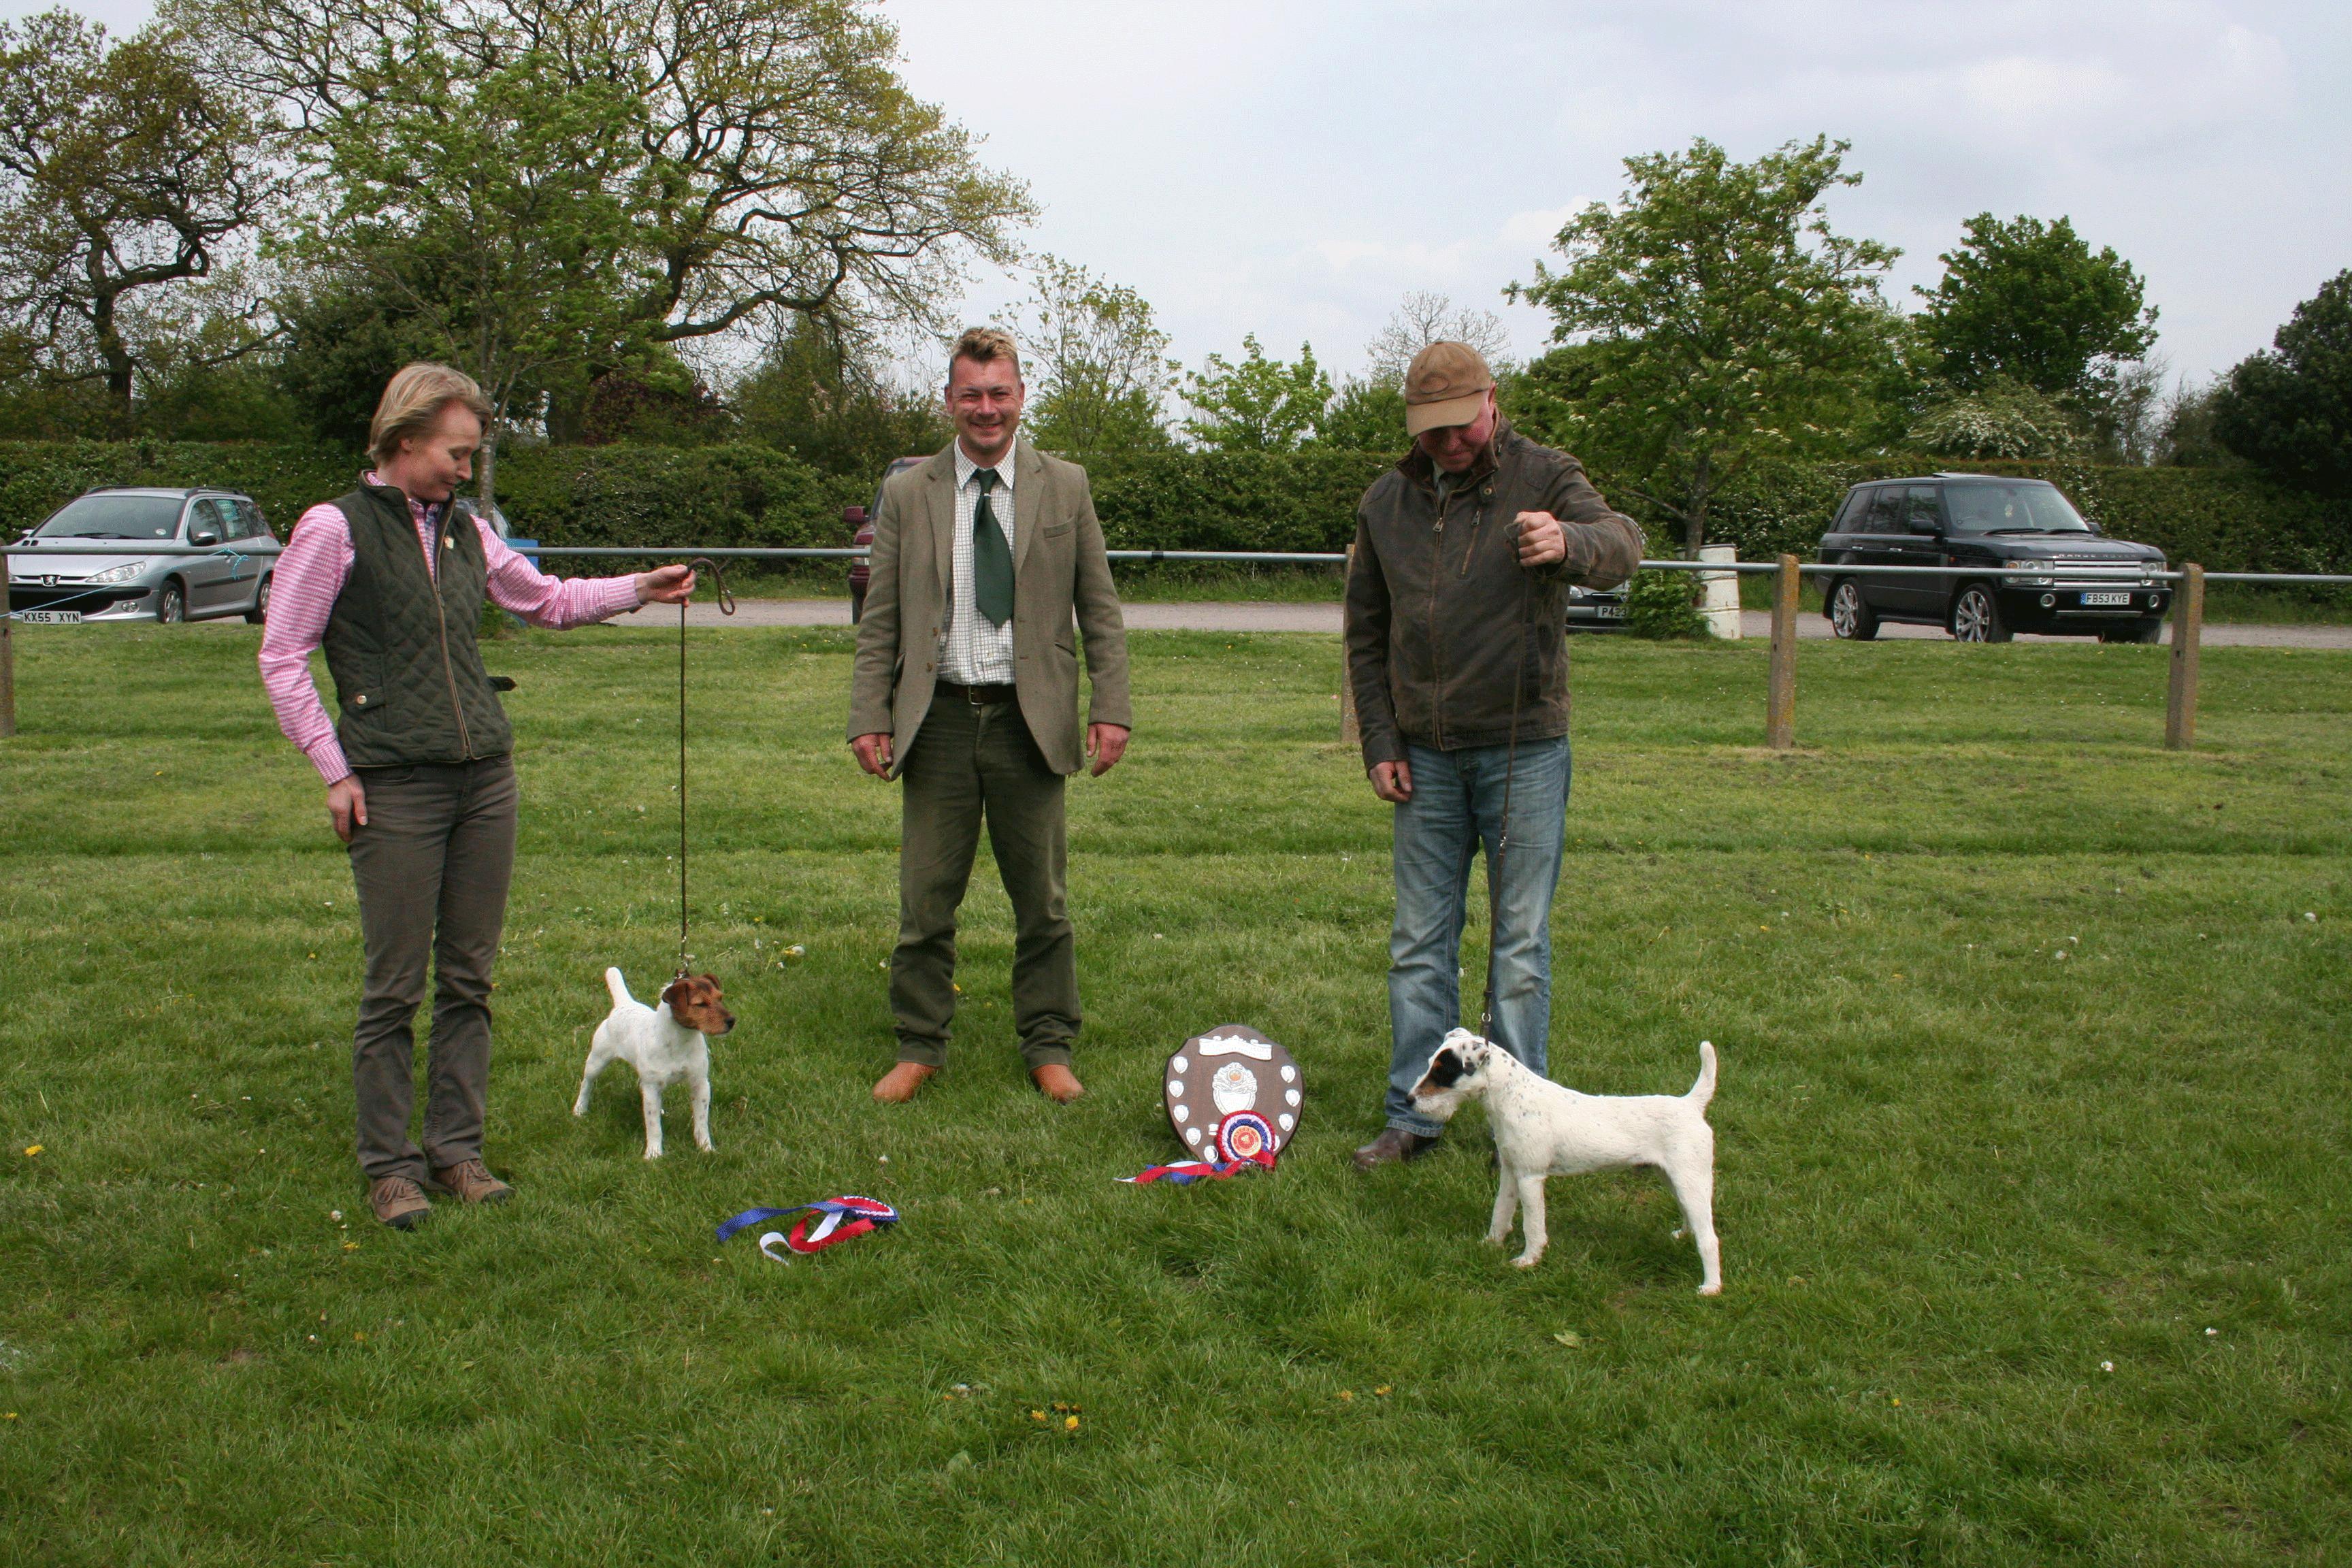 Reserve Best Puppy, Meynell-Sundance Wales, G Mousley & A Makela Champion Puppy, Foxgrove Barney, Steve Parkin Judge Nick Hazeltine